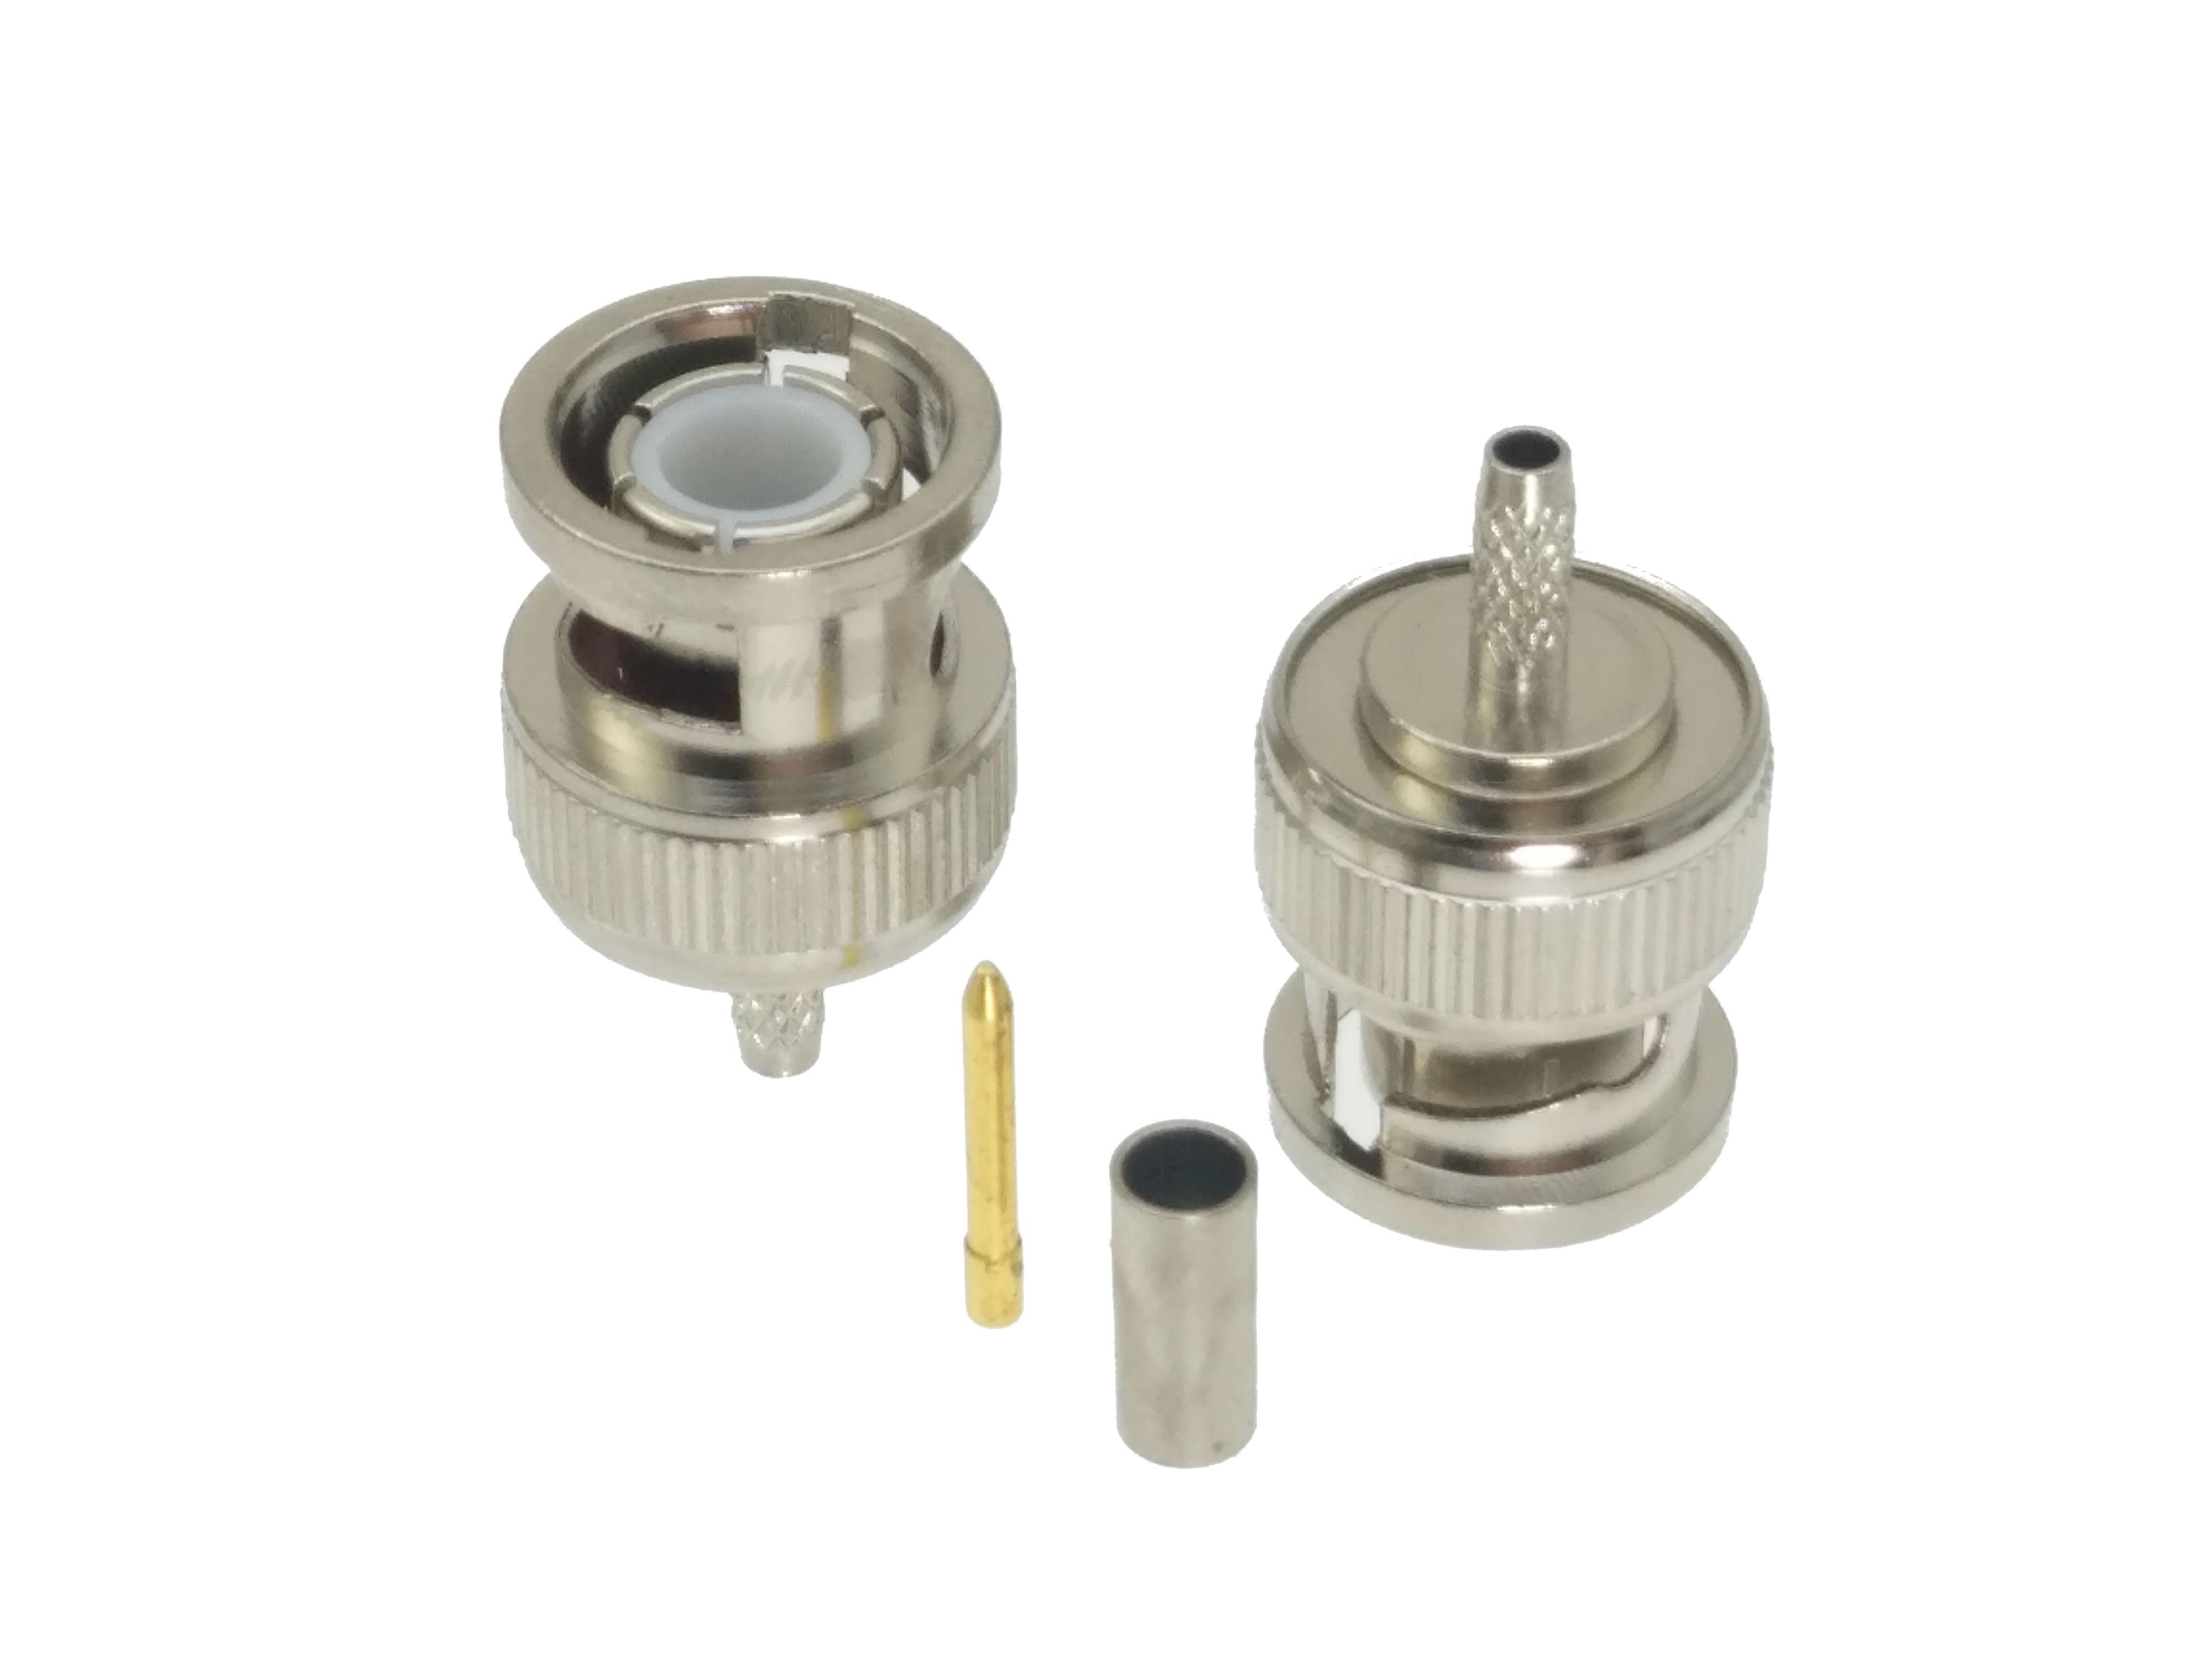 1pcs BNC Male Plug Crimp RG174 LMR100 RG316 Cable RF Coaxial Connector Adapter